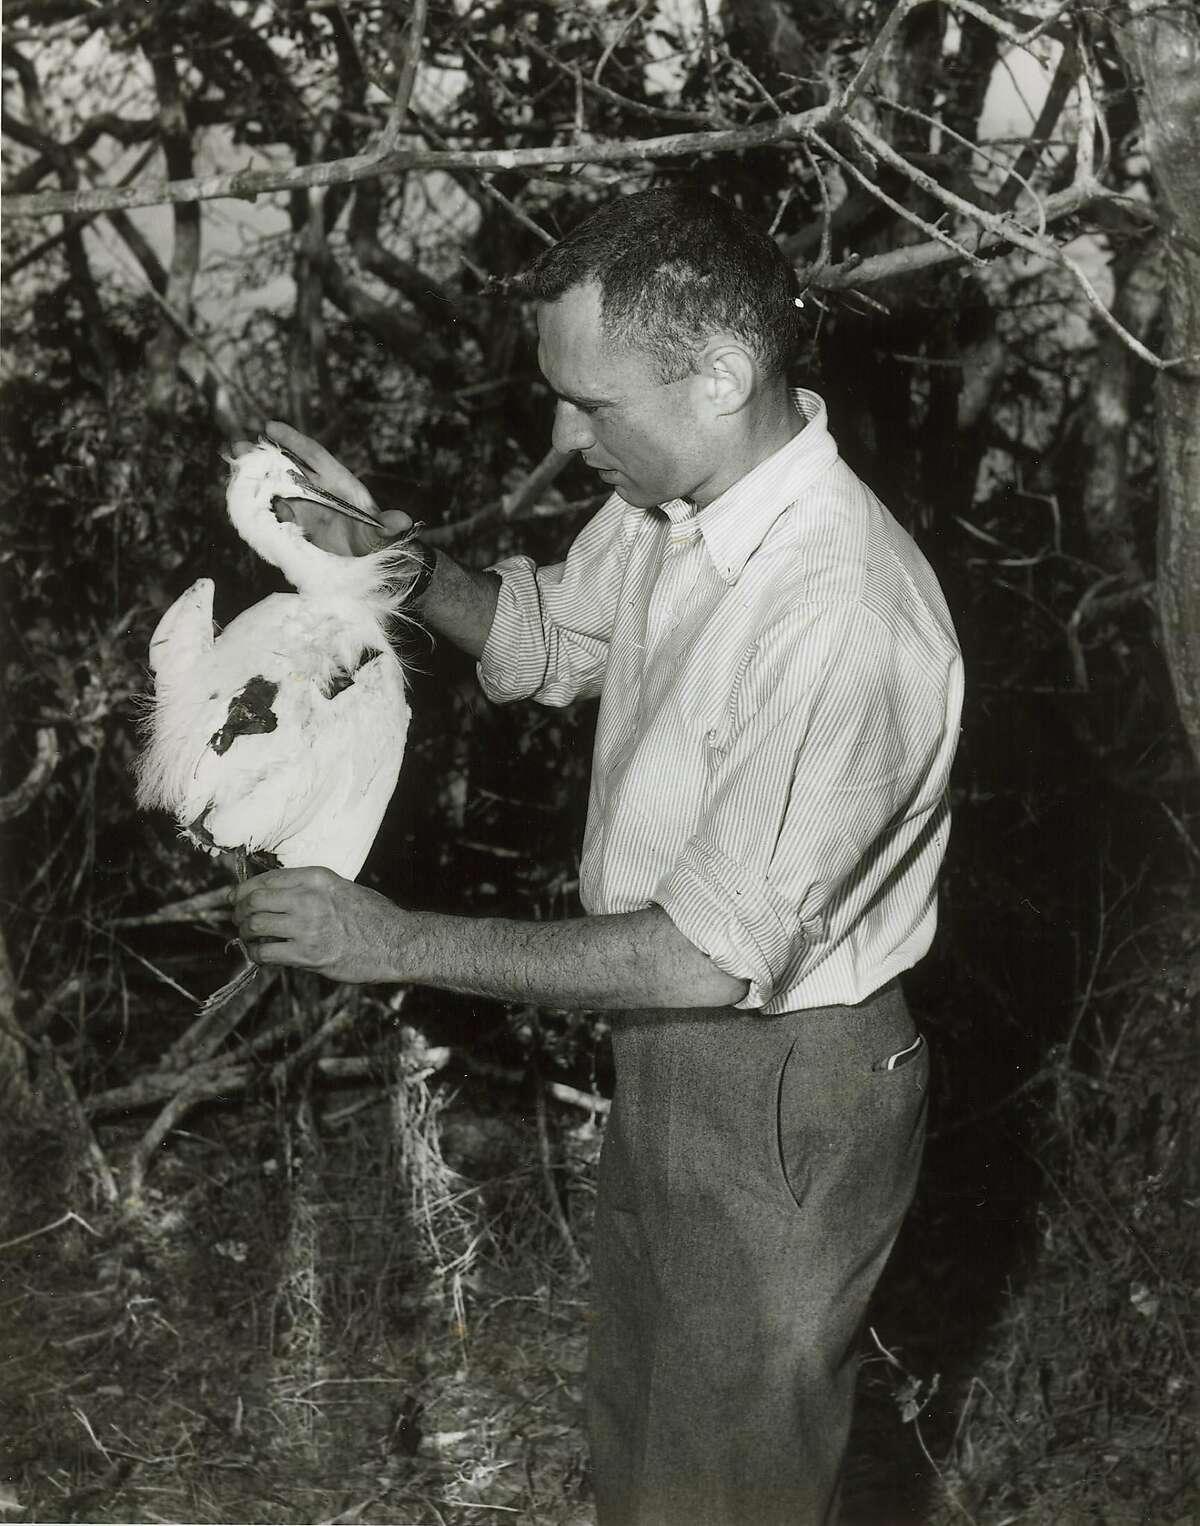 David Perlman - October 12, 1955 - Marin Is. off San Rafael. S.F. Bay.